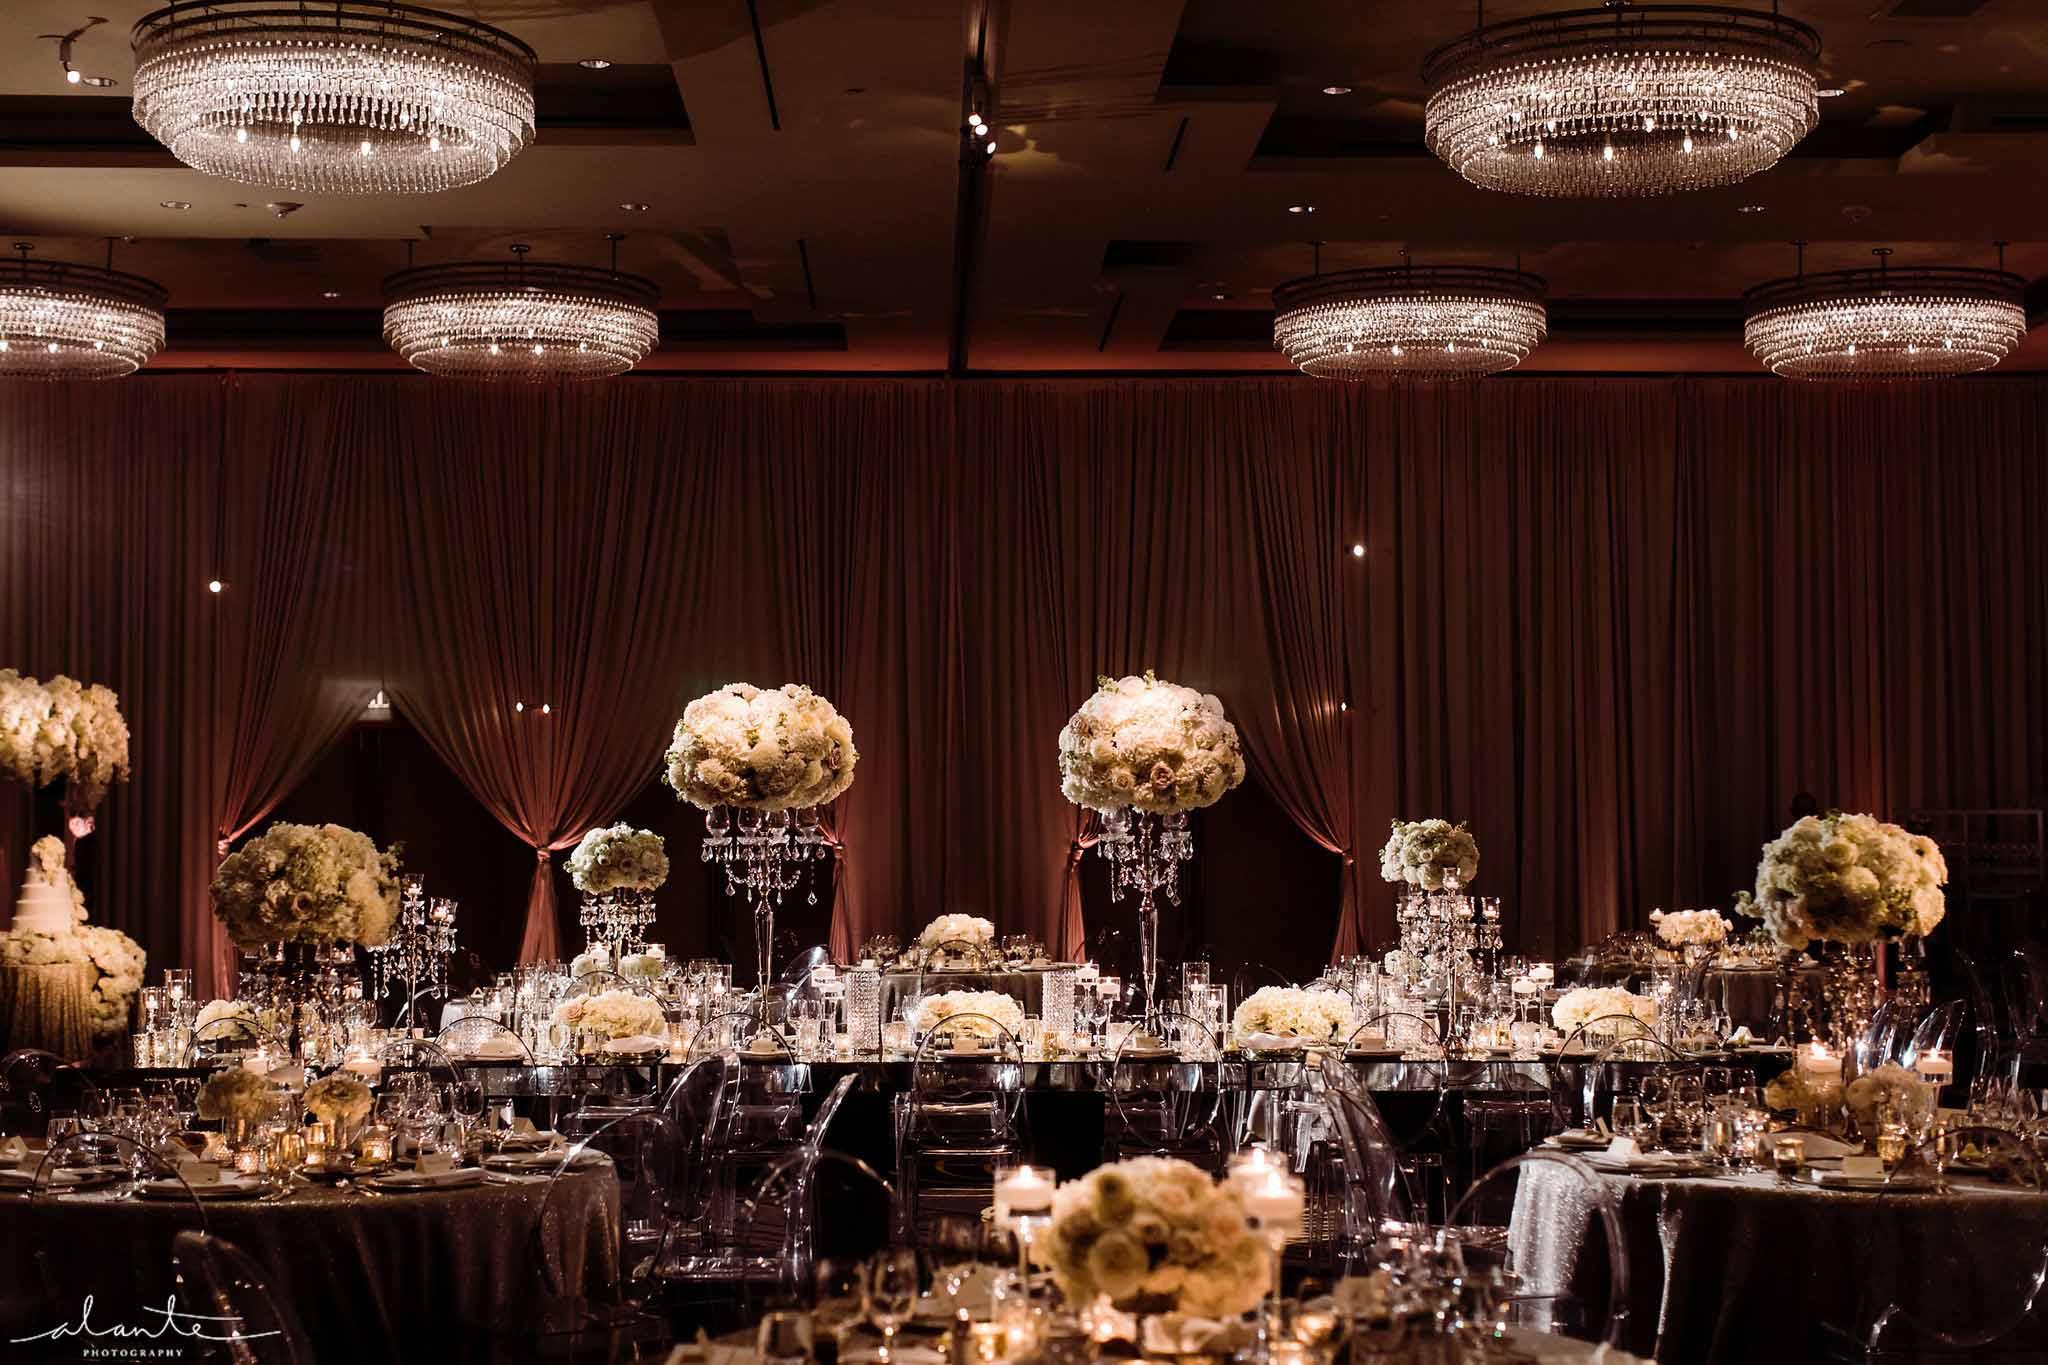 Elegant ballroom wedding reception - Luxury Winter Wedding at the Four Seasons by Flora Nova Design Seattle